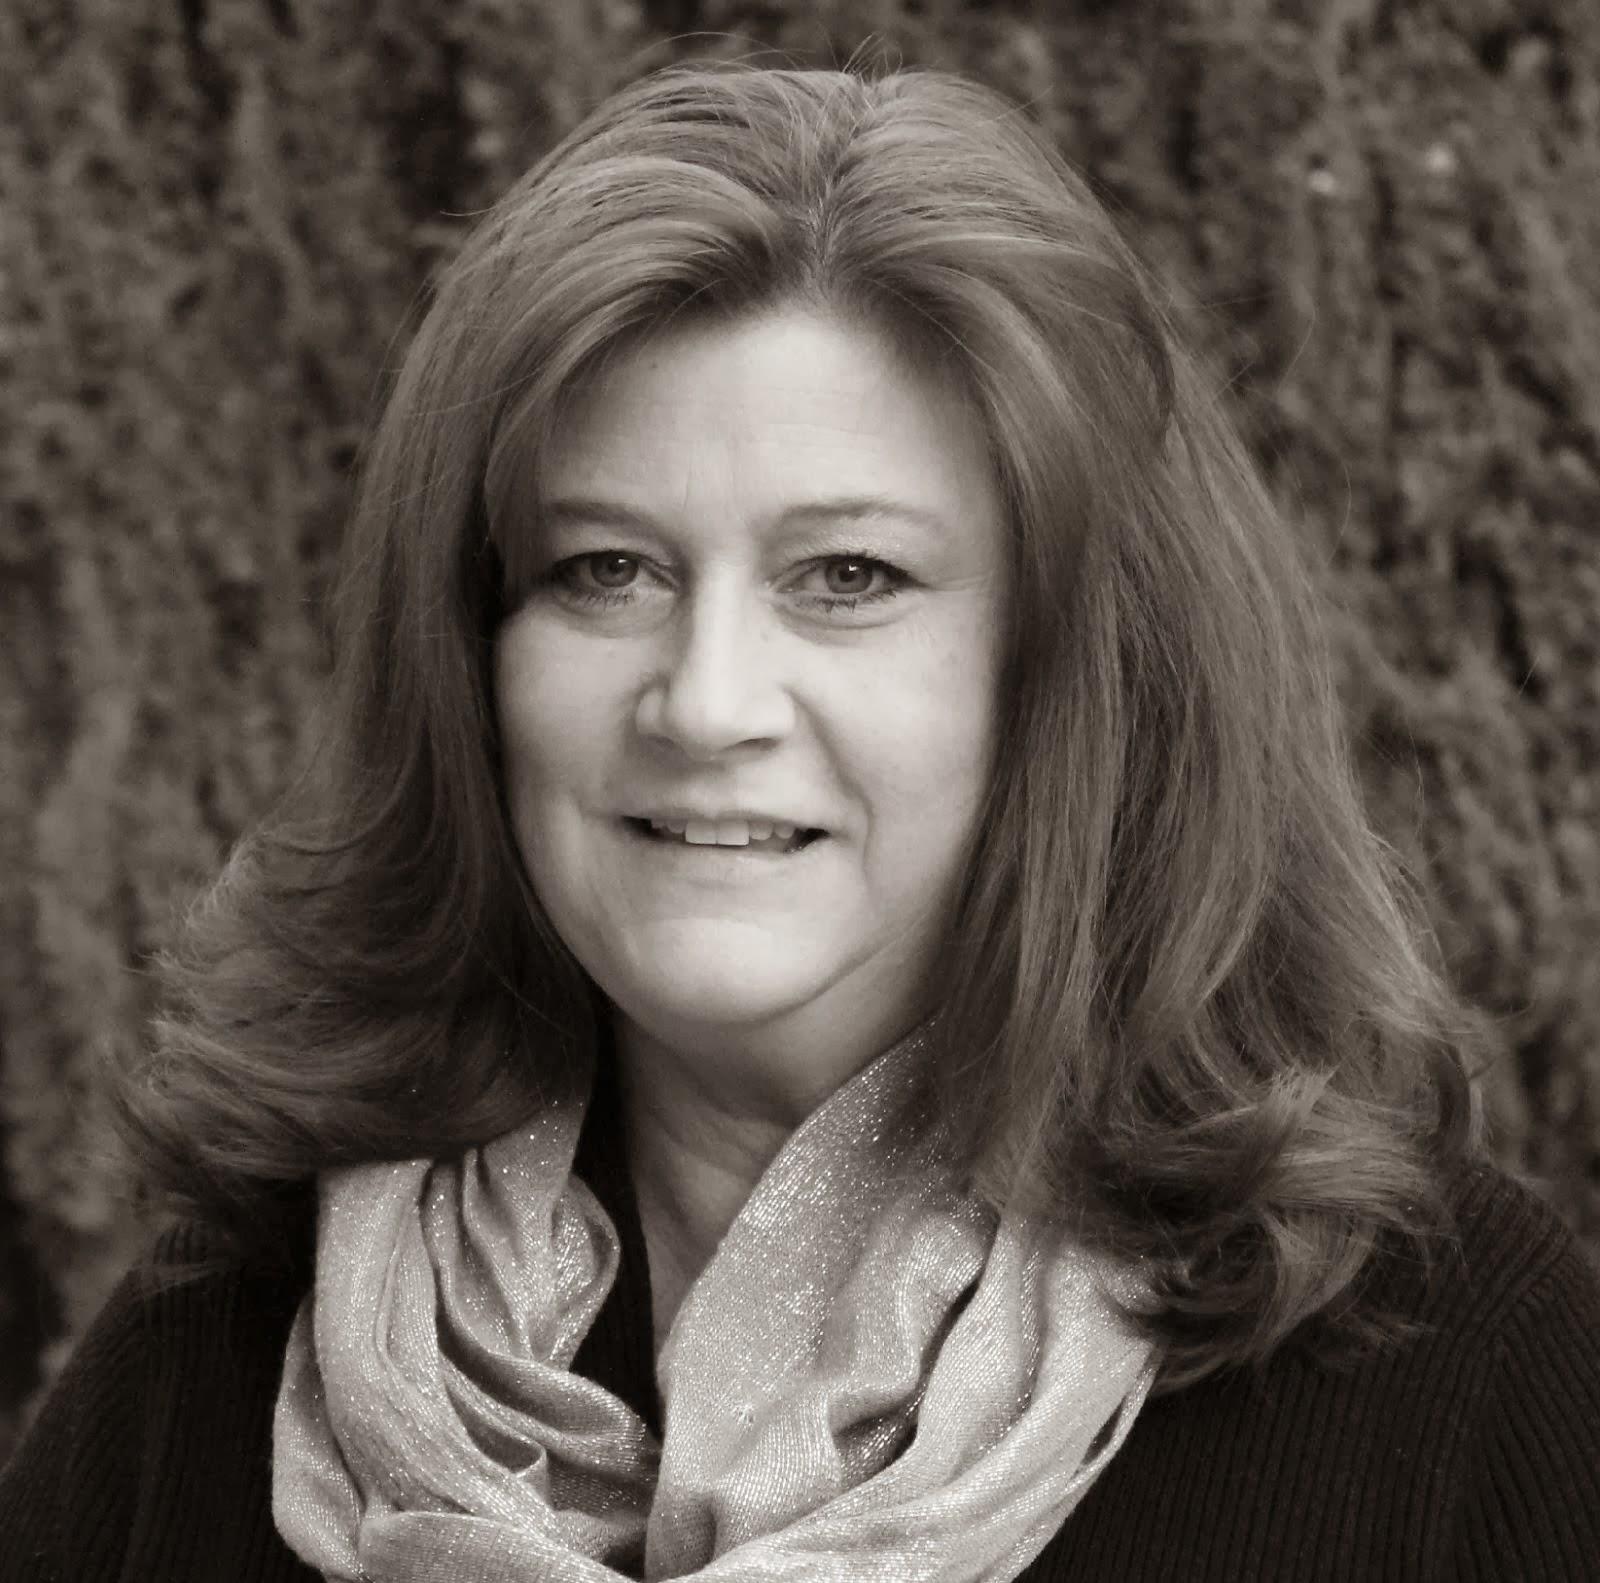 Karen L. - Blog Administrator